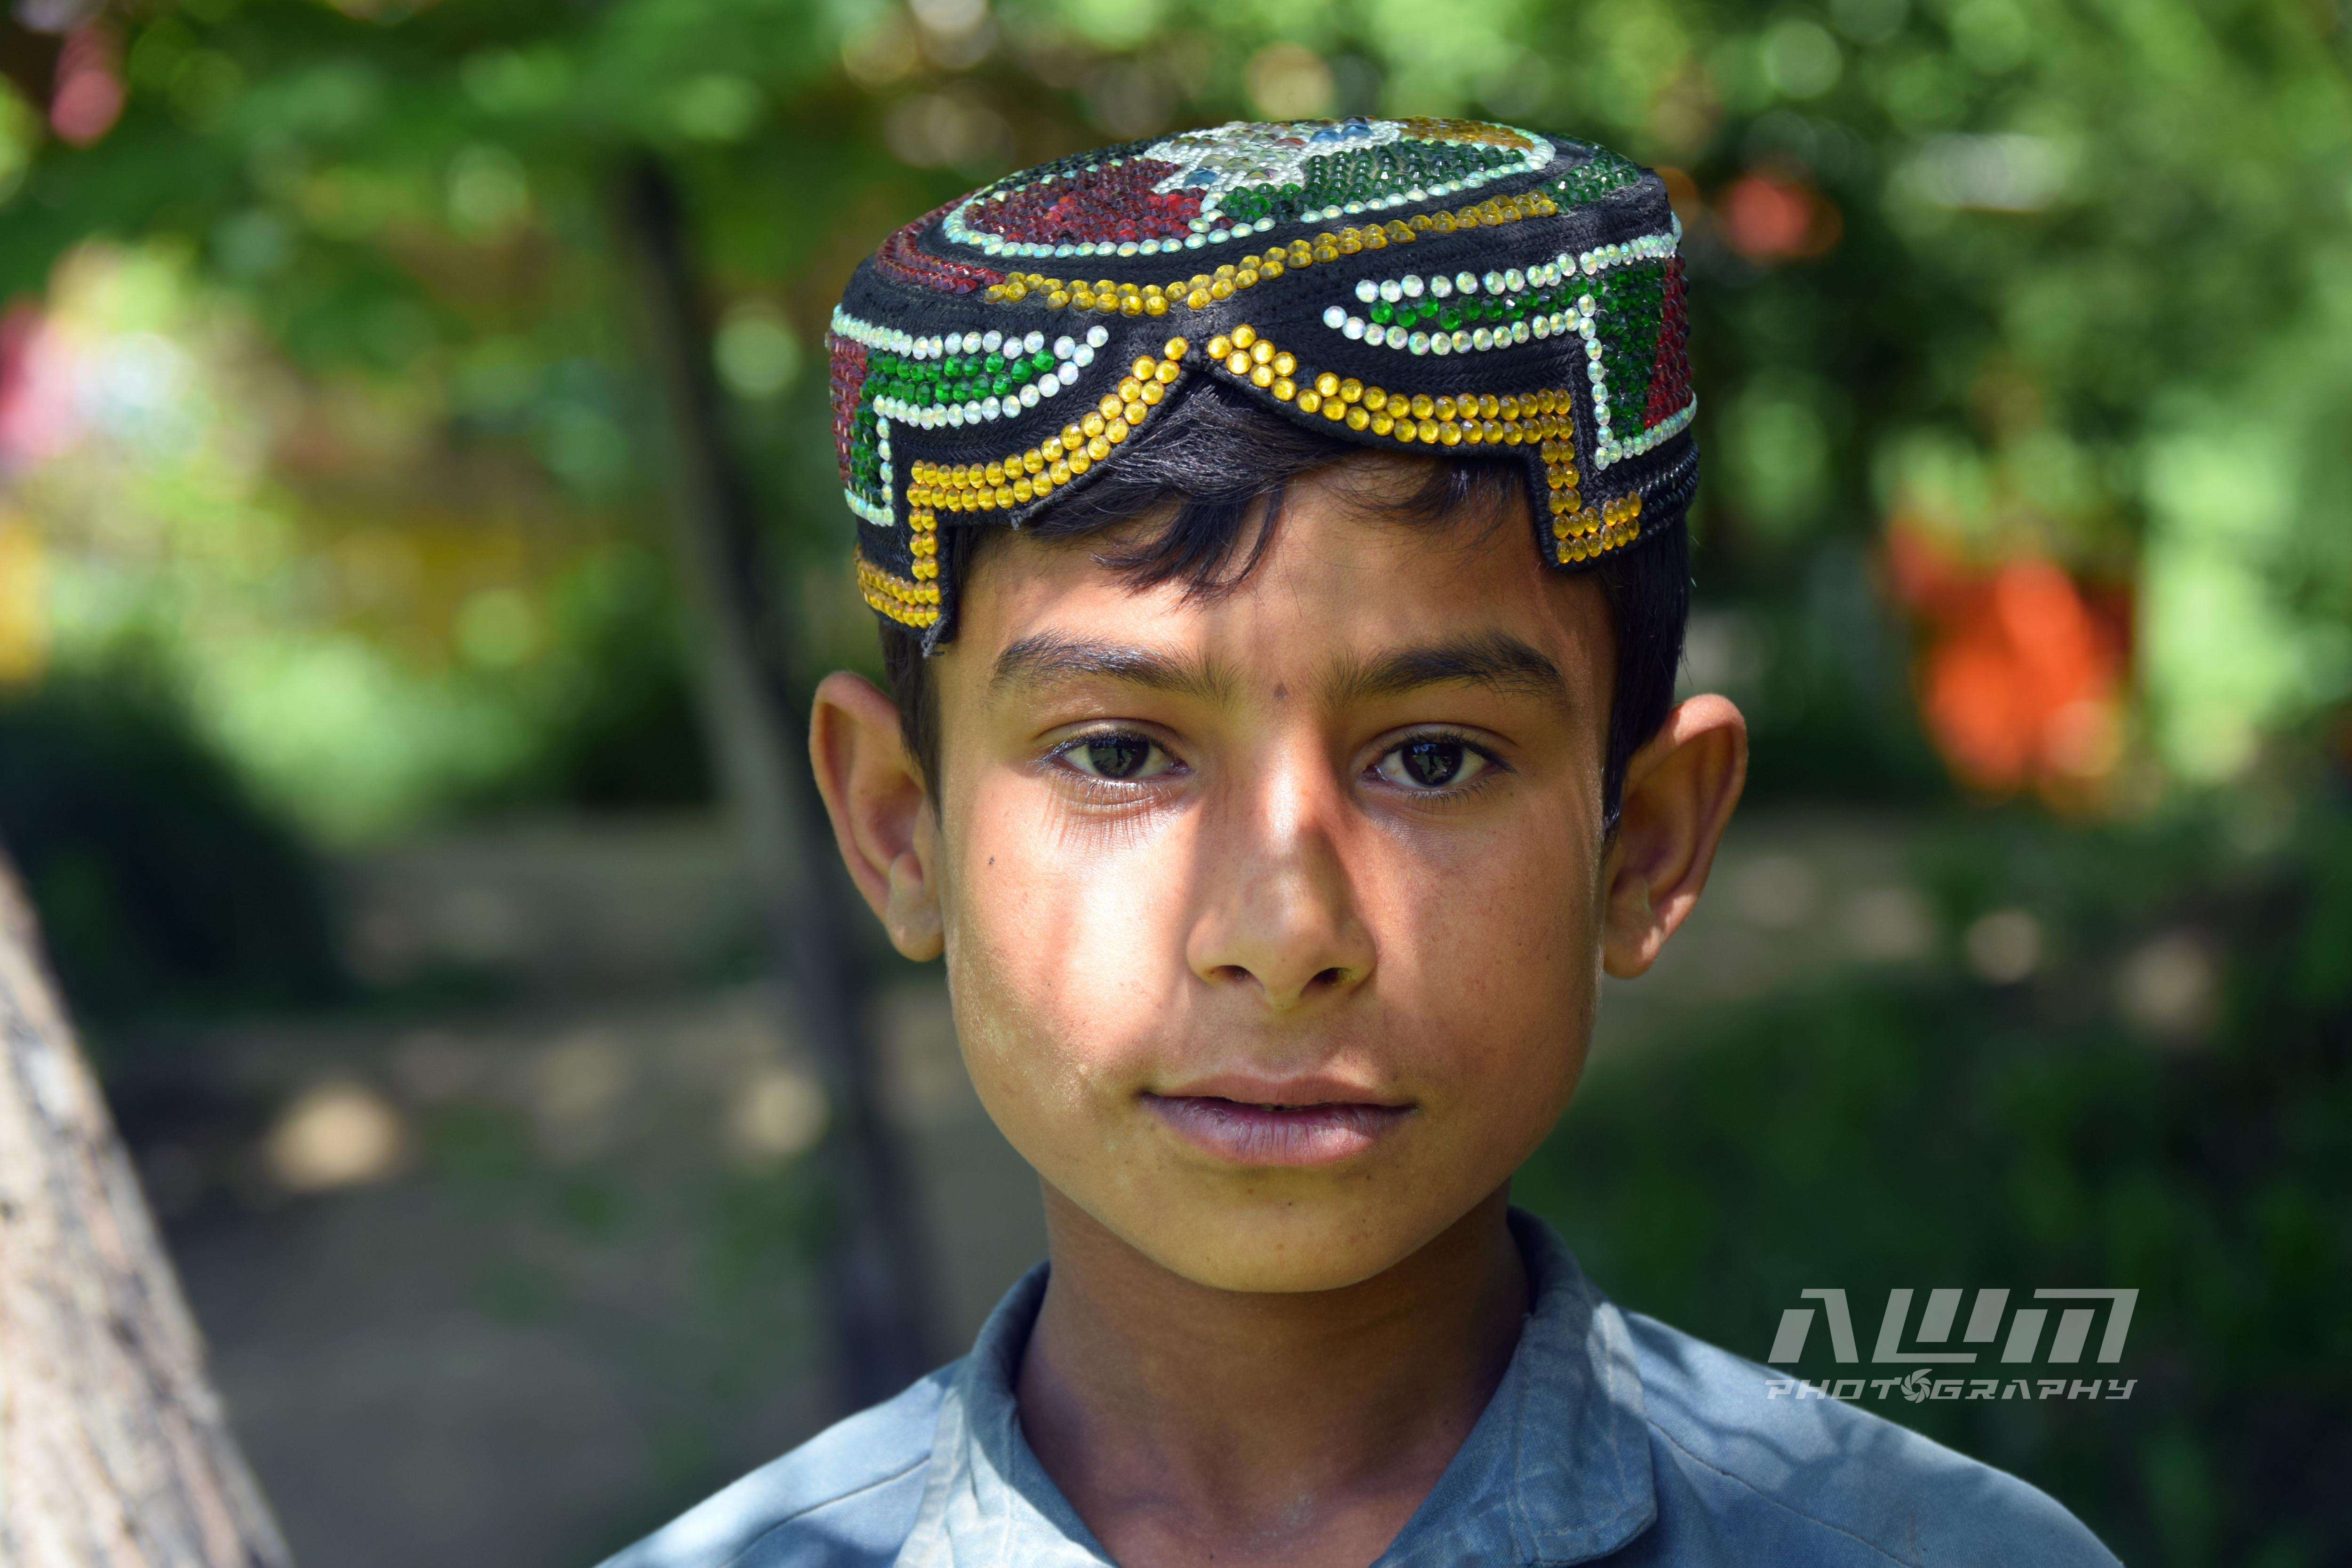 Helmand Boy